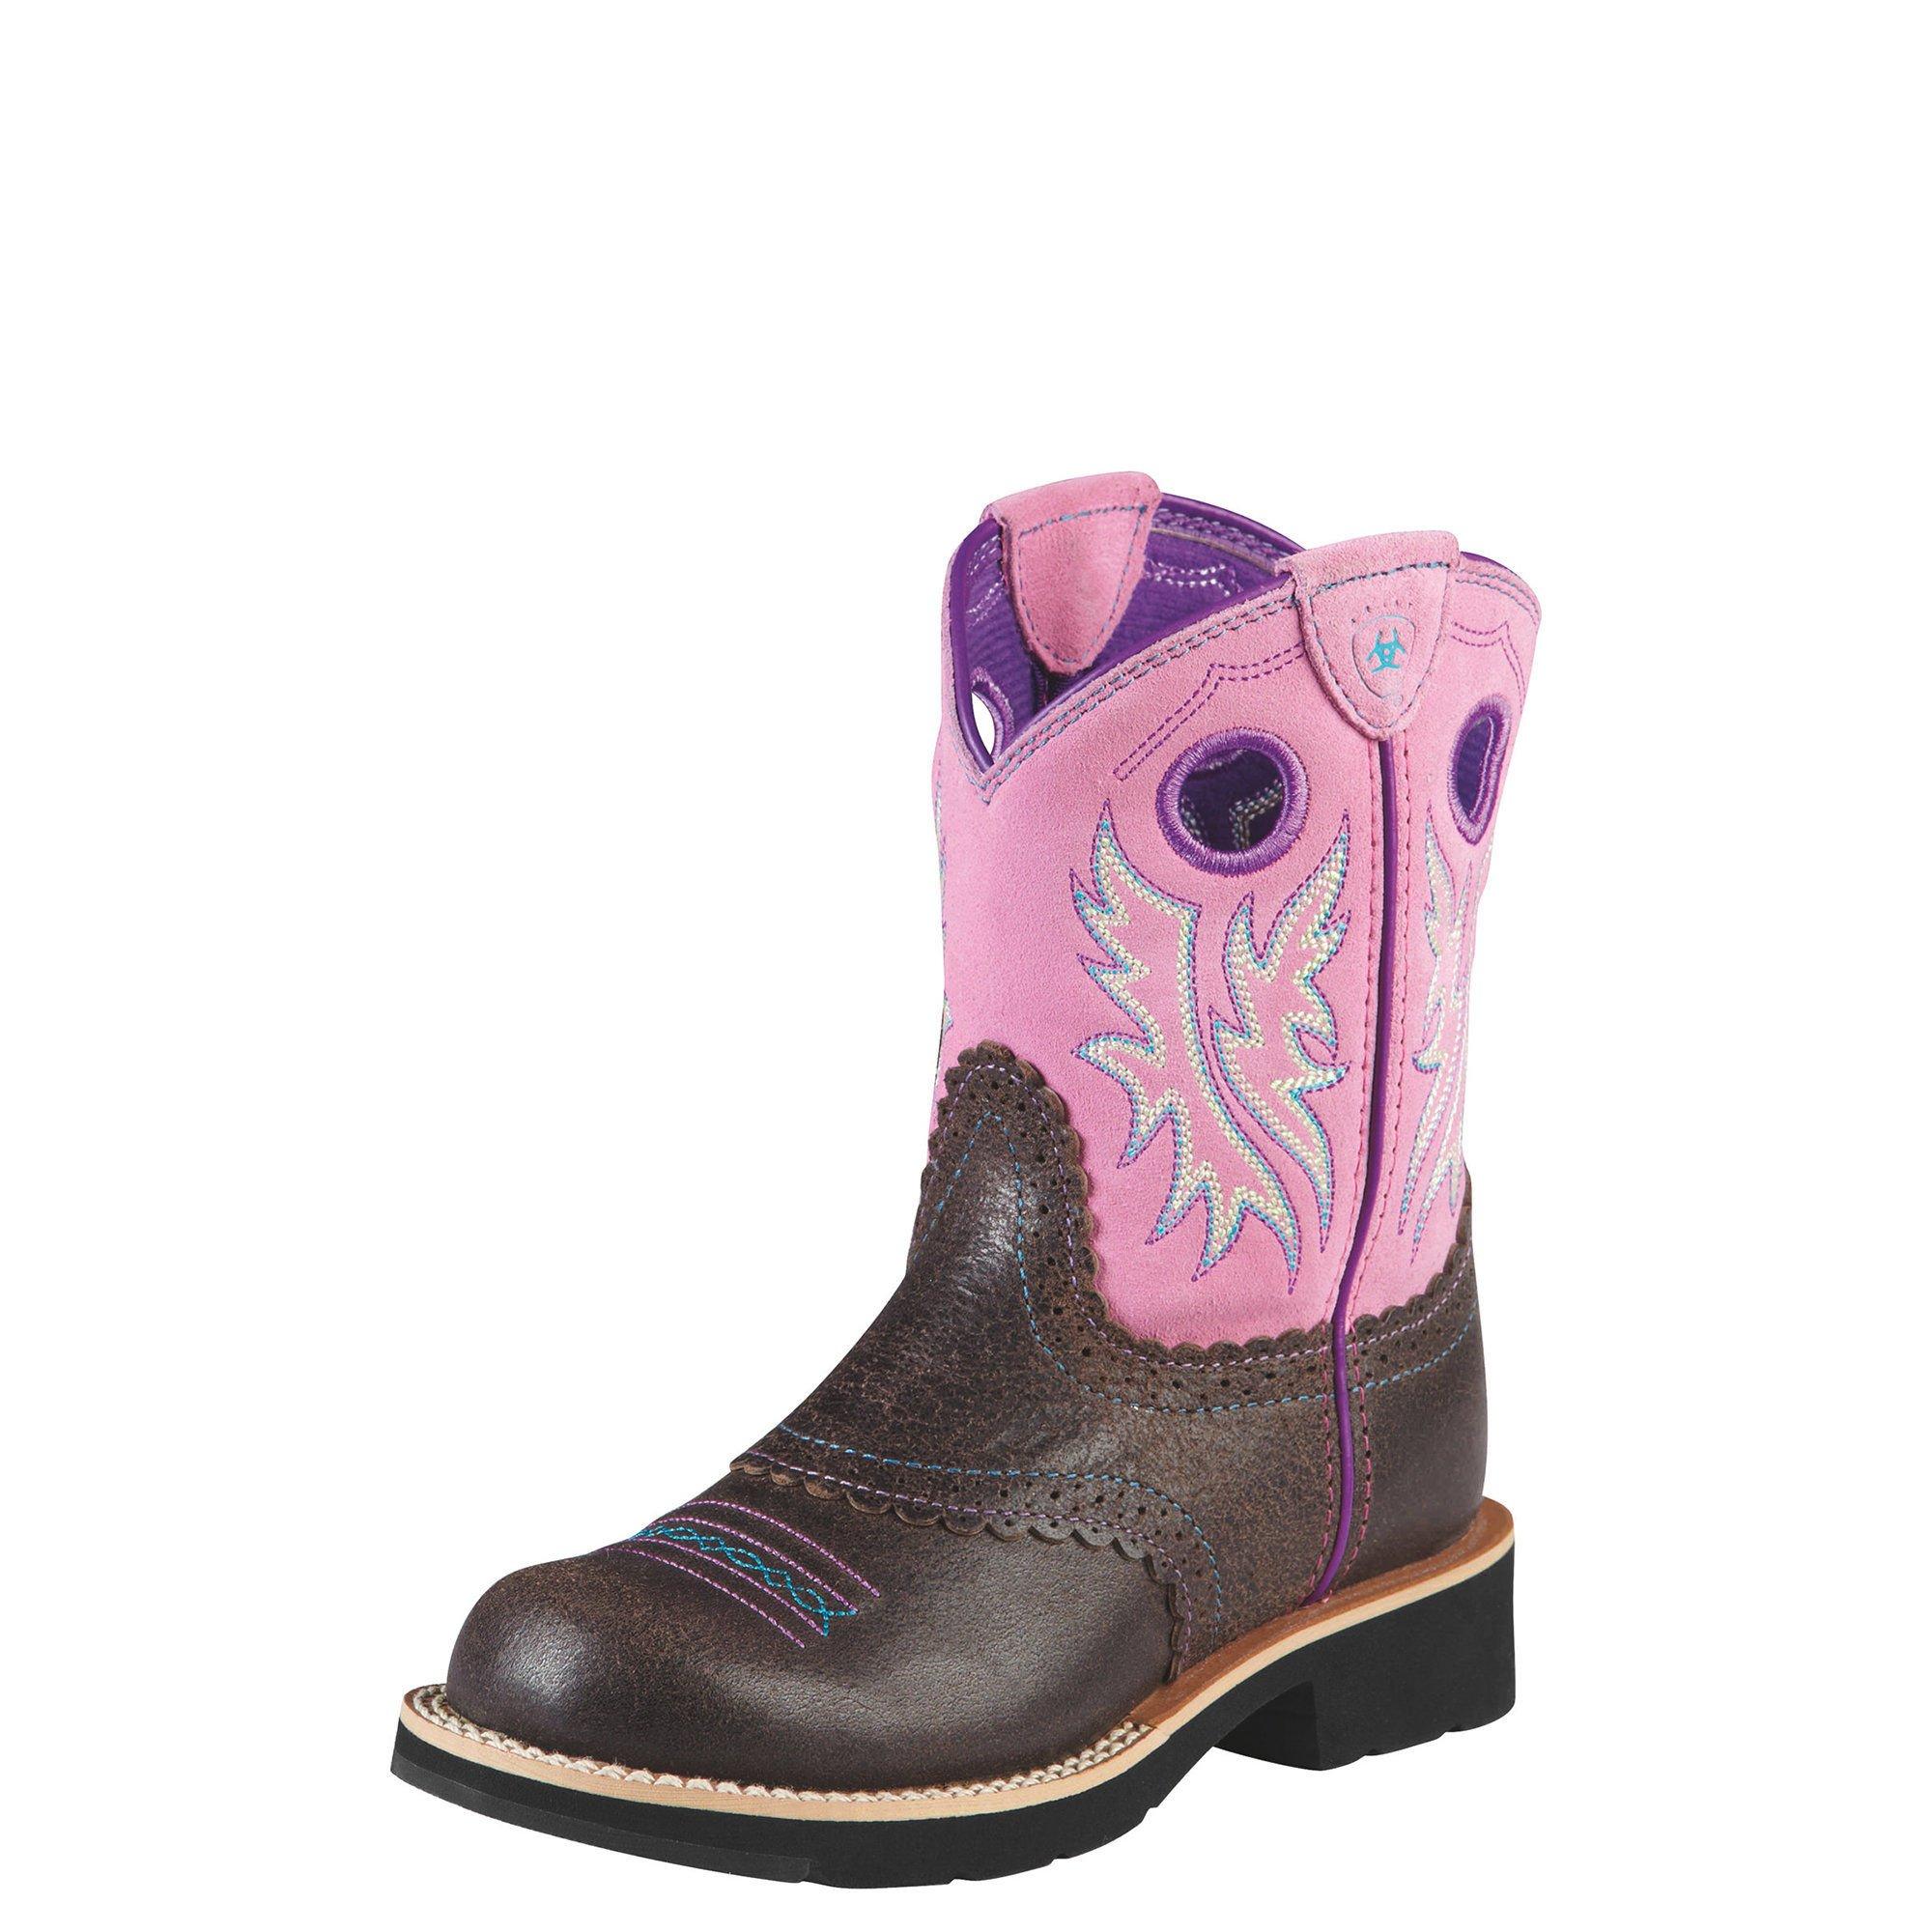 Kids' Fatbaby Cowgirl Western Boot (Toddler/Little Kid/Big Kid),Roughed Chocolate/Bubblegum,6 M US Big Kid